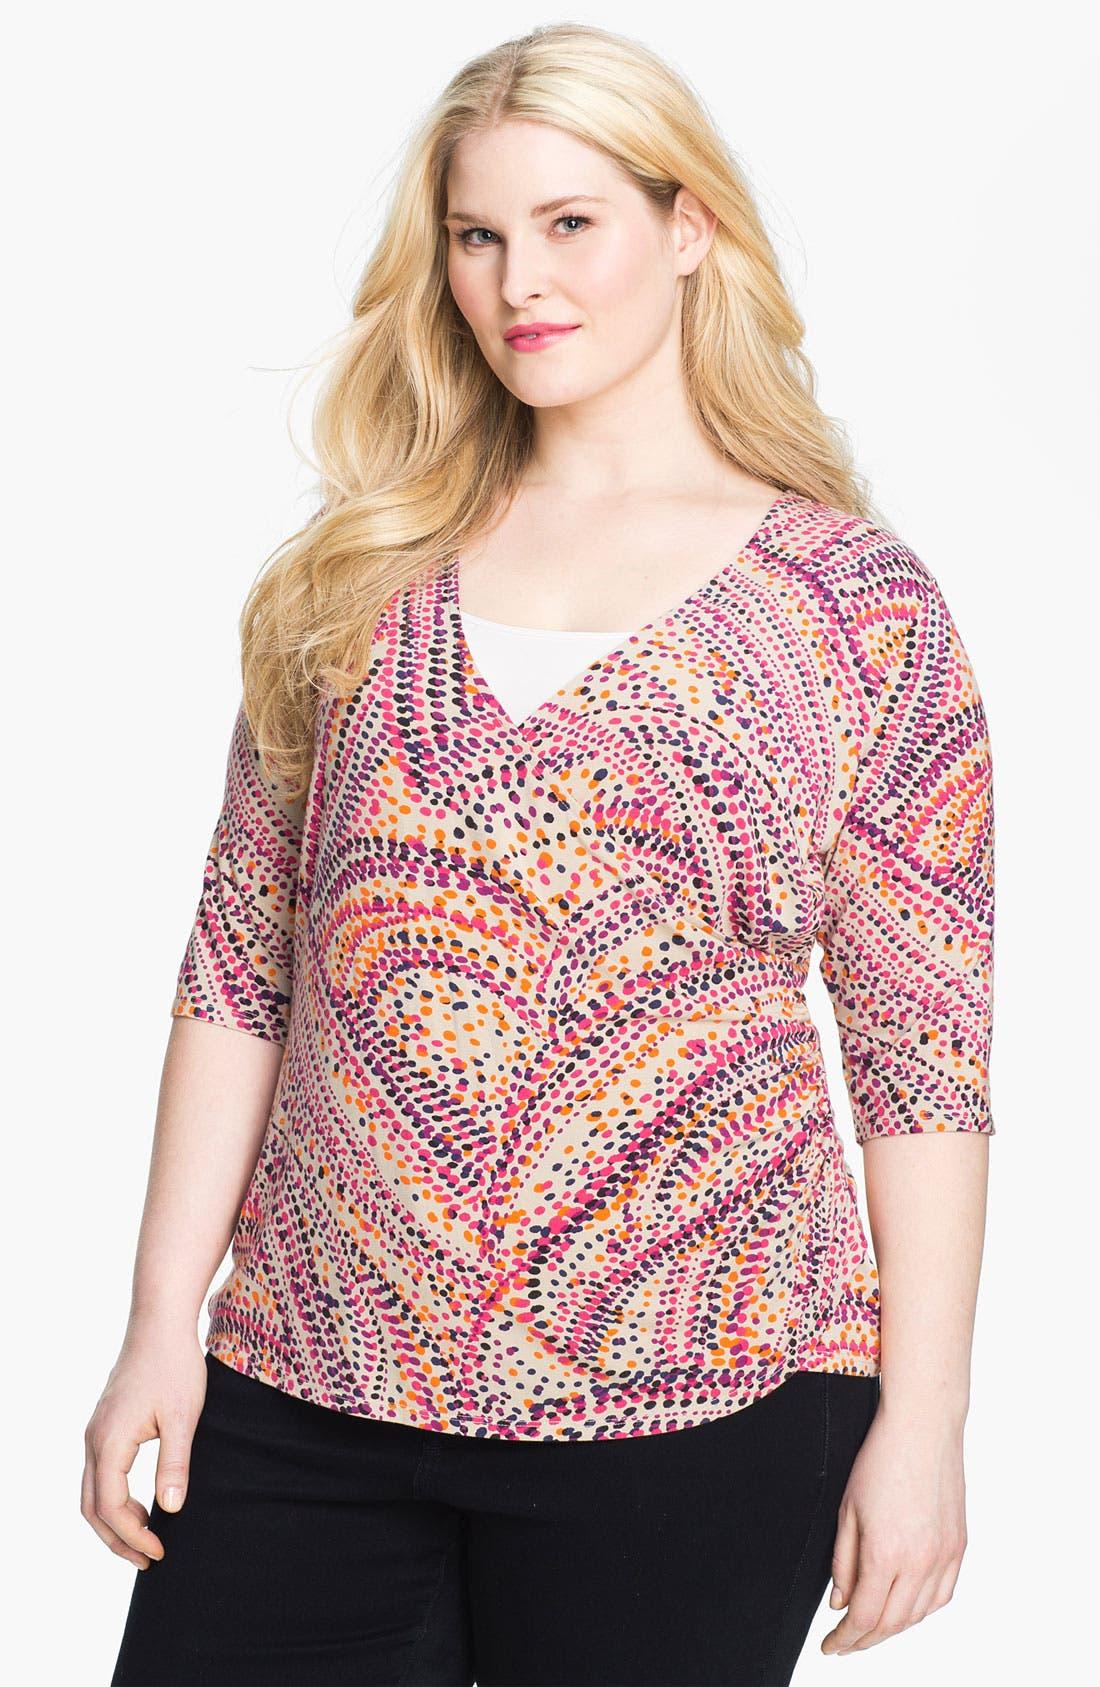 Alternate Image 1 Selected - Sejour 'Essential' Surplice Knit Top (Plus)